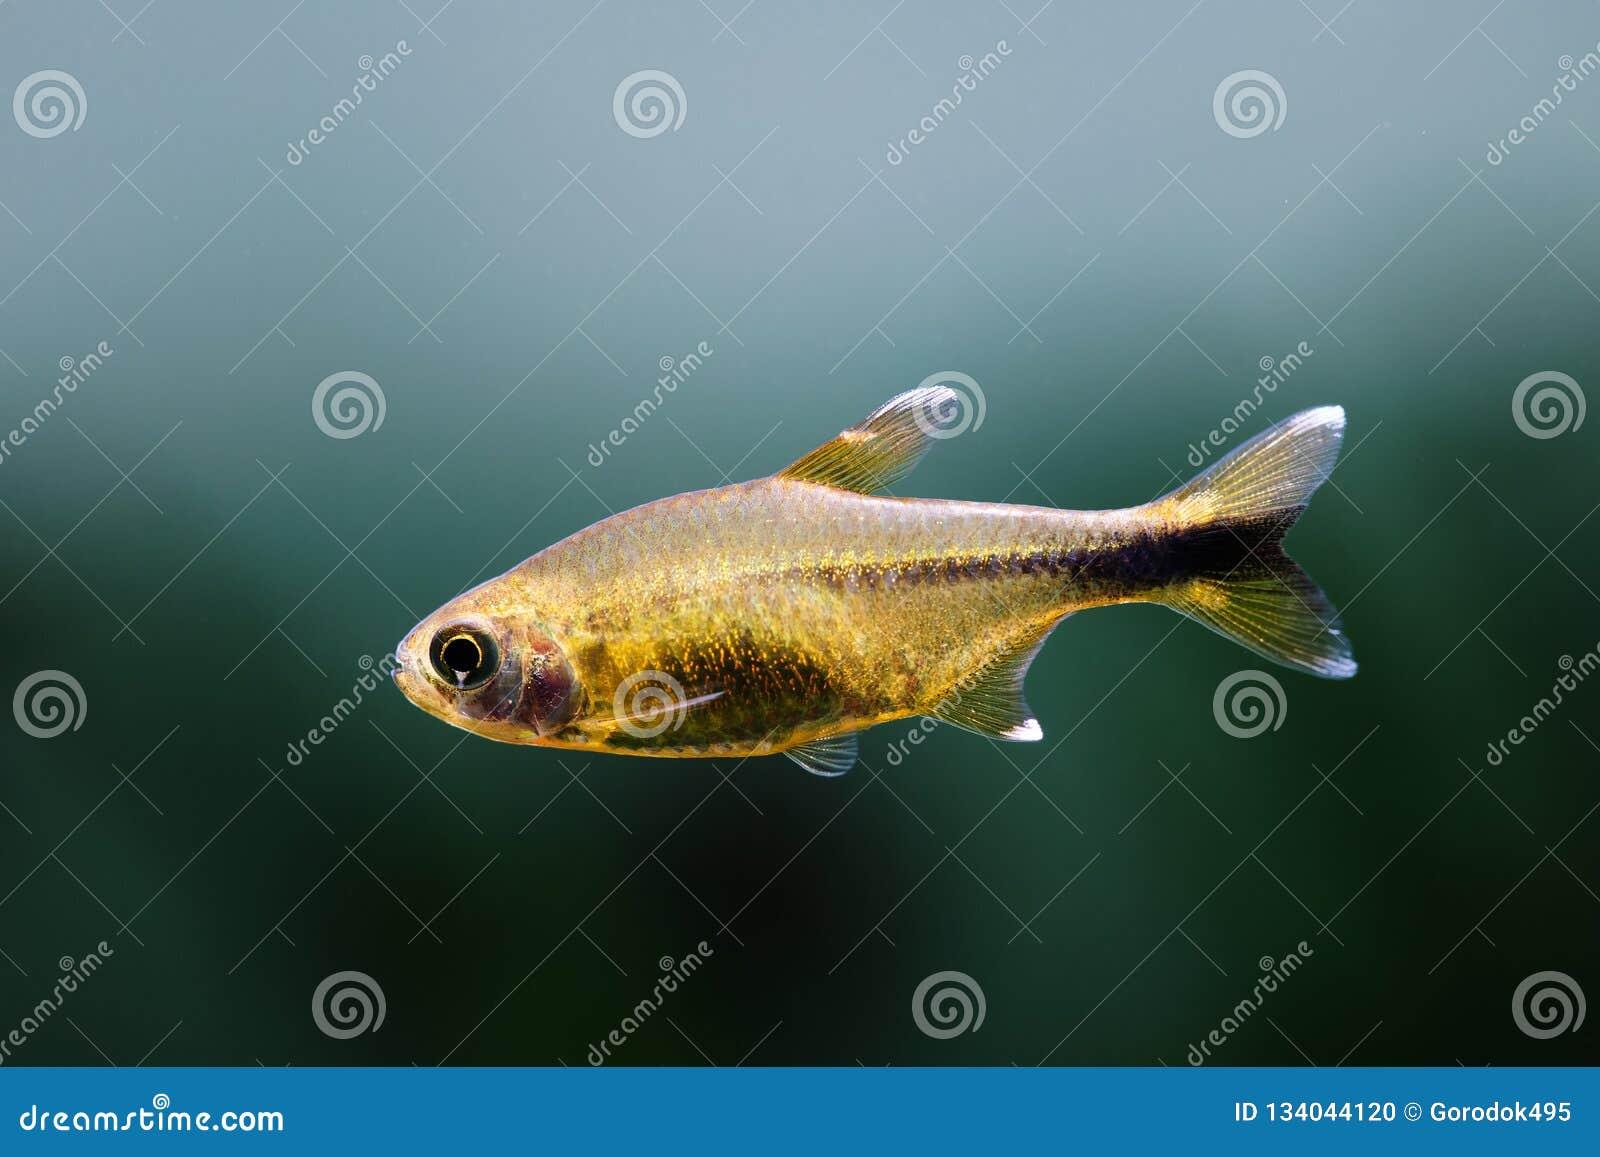 Aquarium fish Silver Tipped Tetra. Macro view orange gold color fish pattern, soft focus blurred background